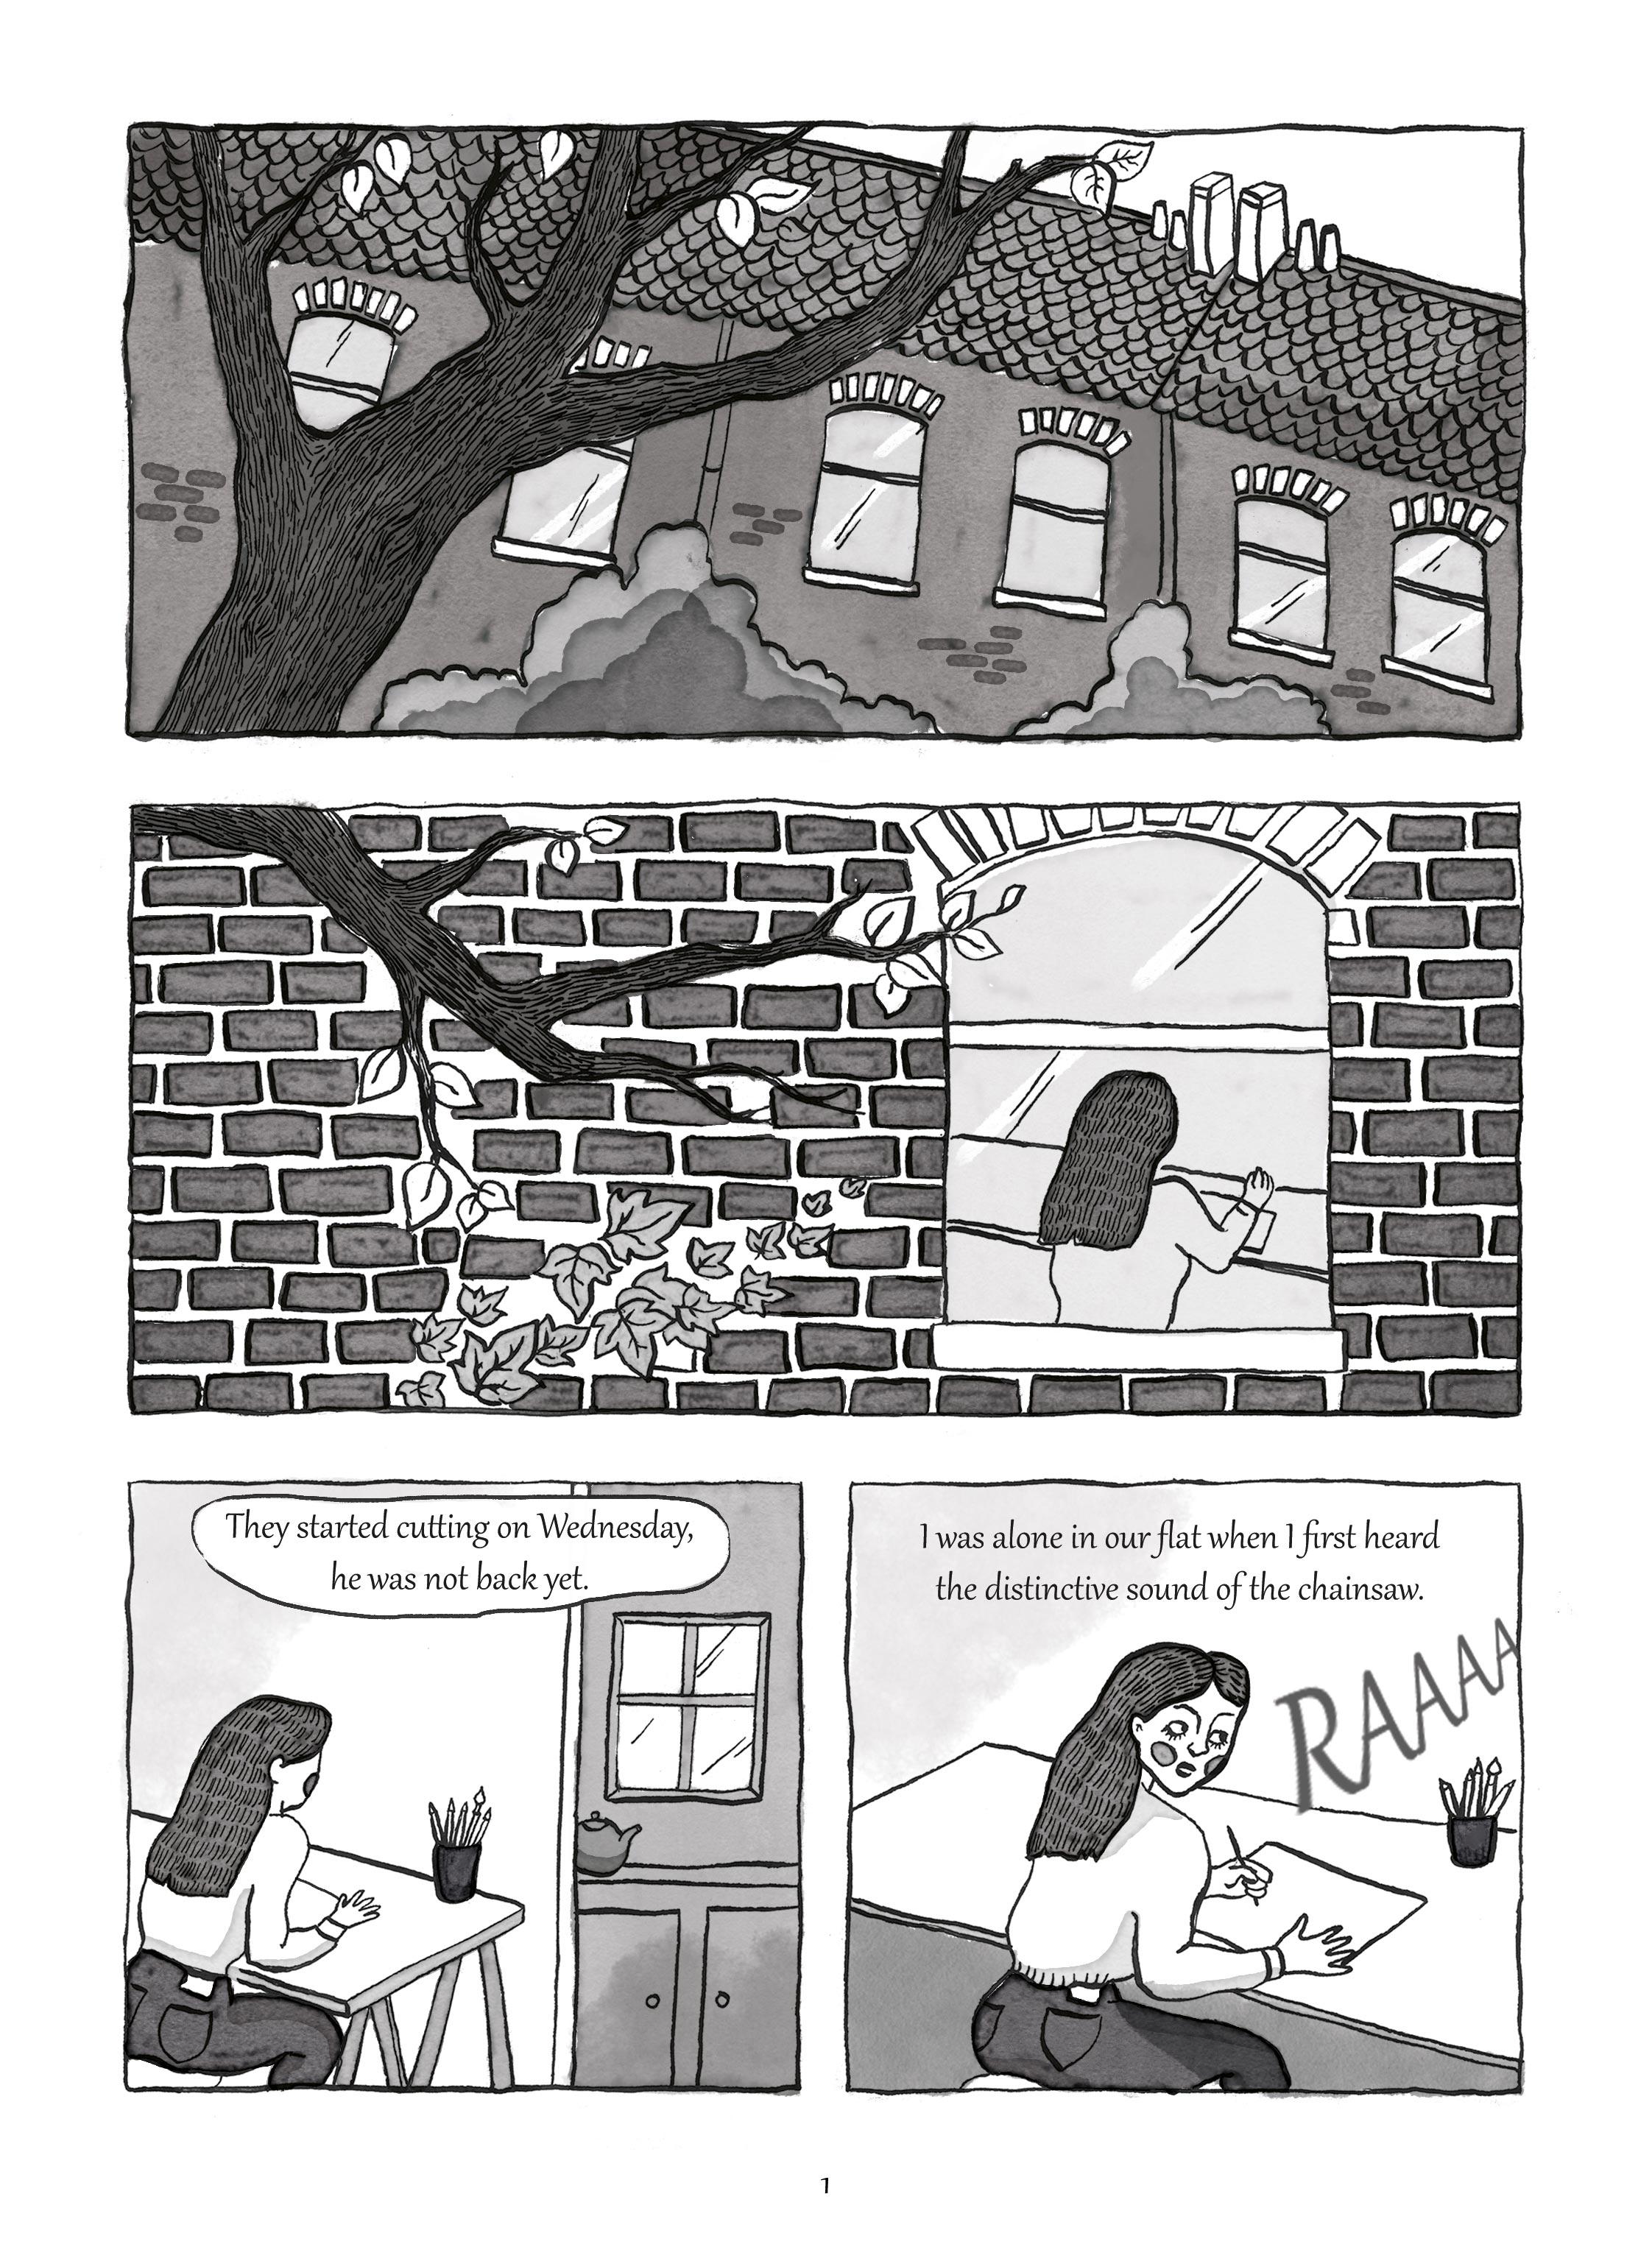 Marie-de-Beaucourt-Illustration-Two-Trees-Graphic-Novel-page1.jpg